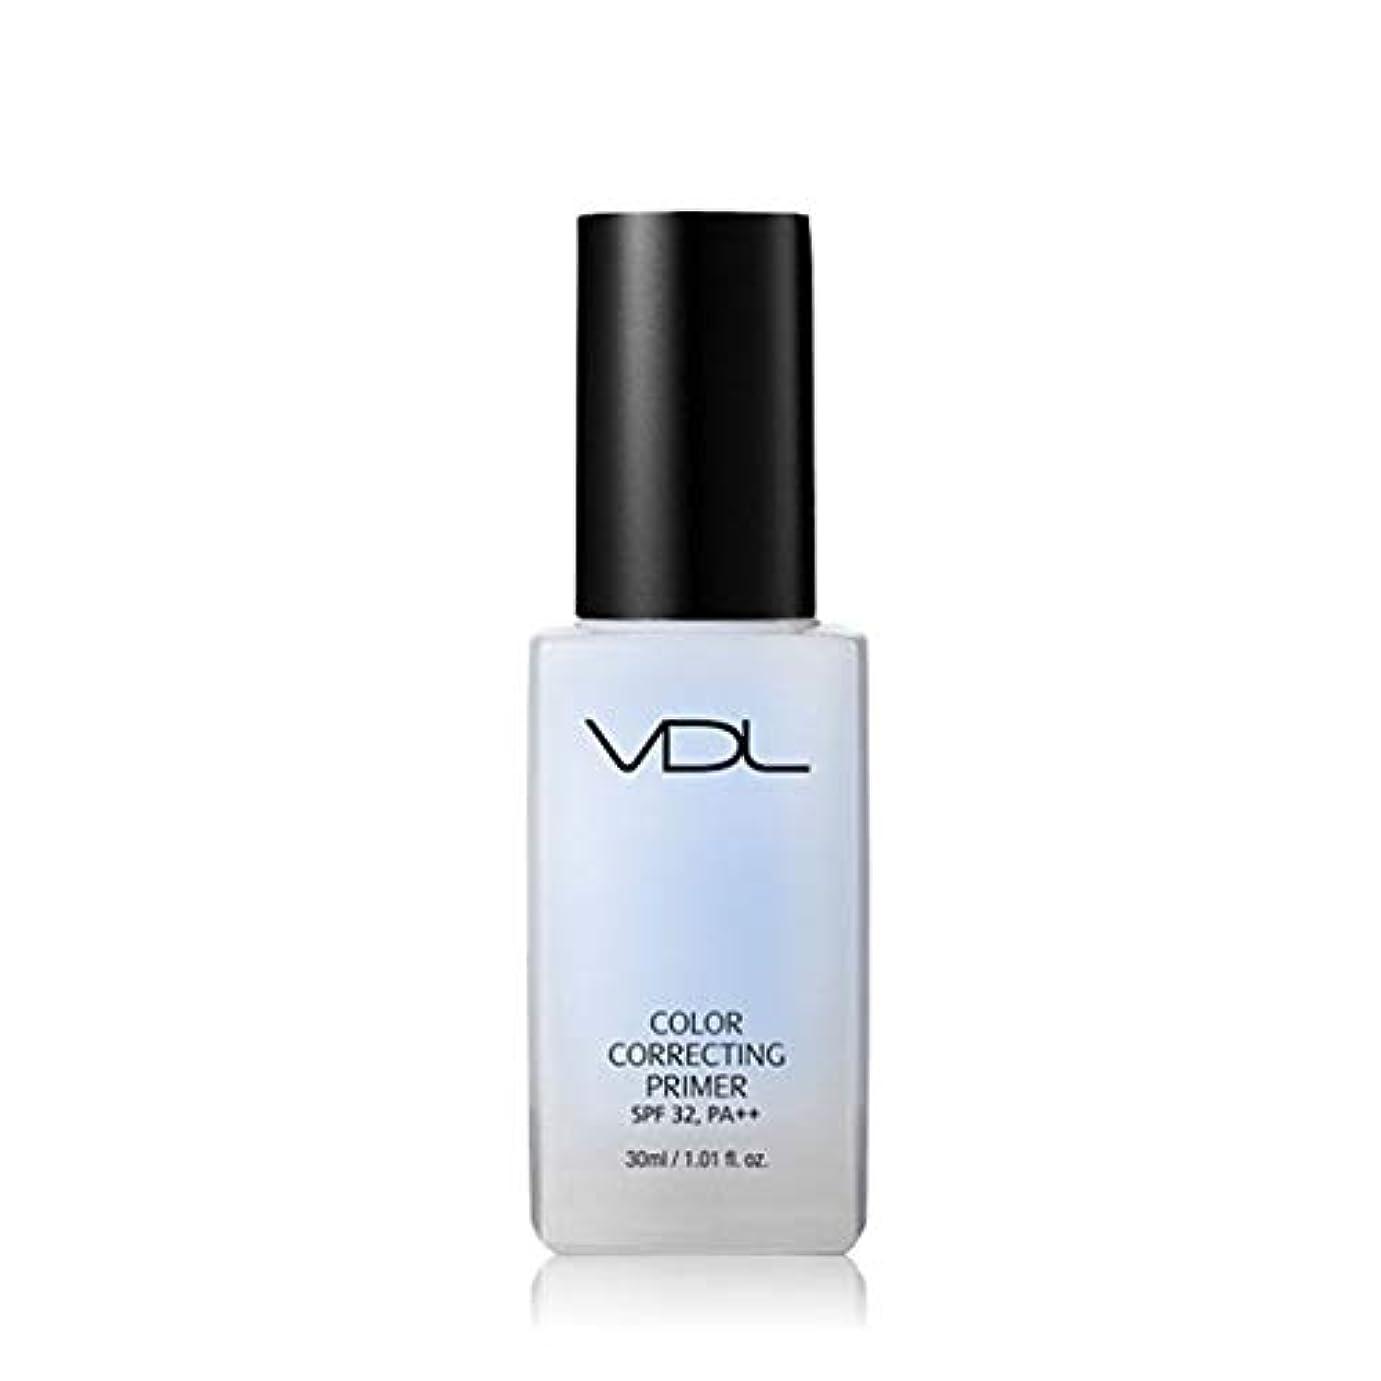 VDLカラーコレクティンプライマー30ml 3カラーメイクアップベース、VDL Color Correcting Primer 30ml 3-Colors Make-up Base [並行輸入品] (Serenity)